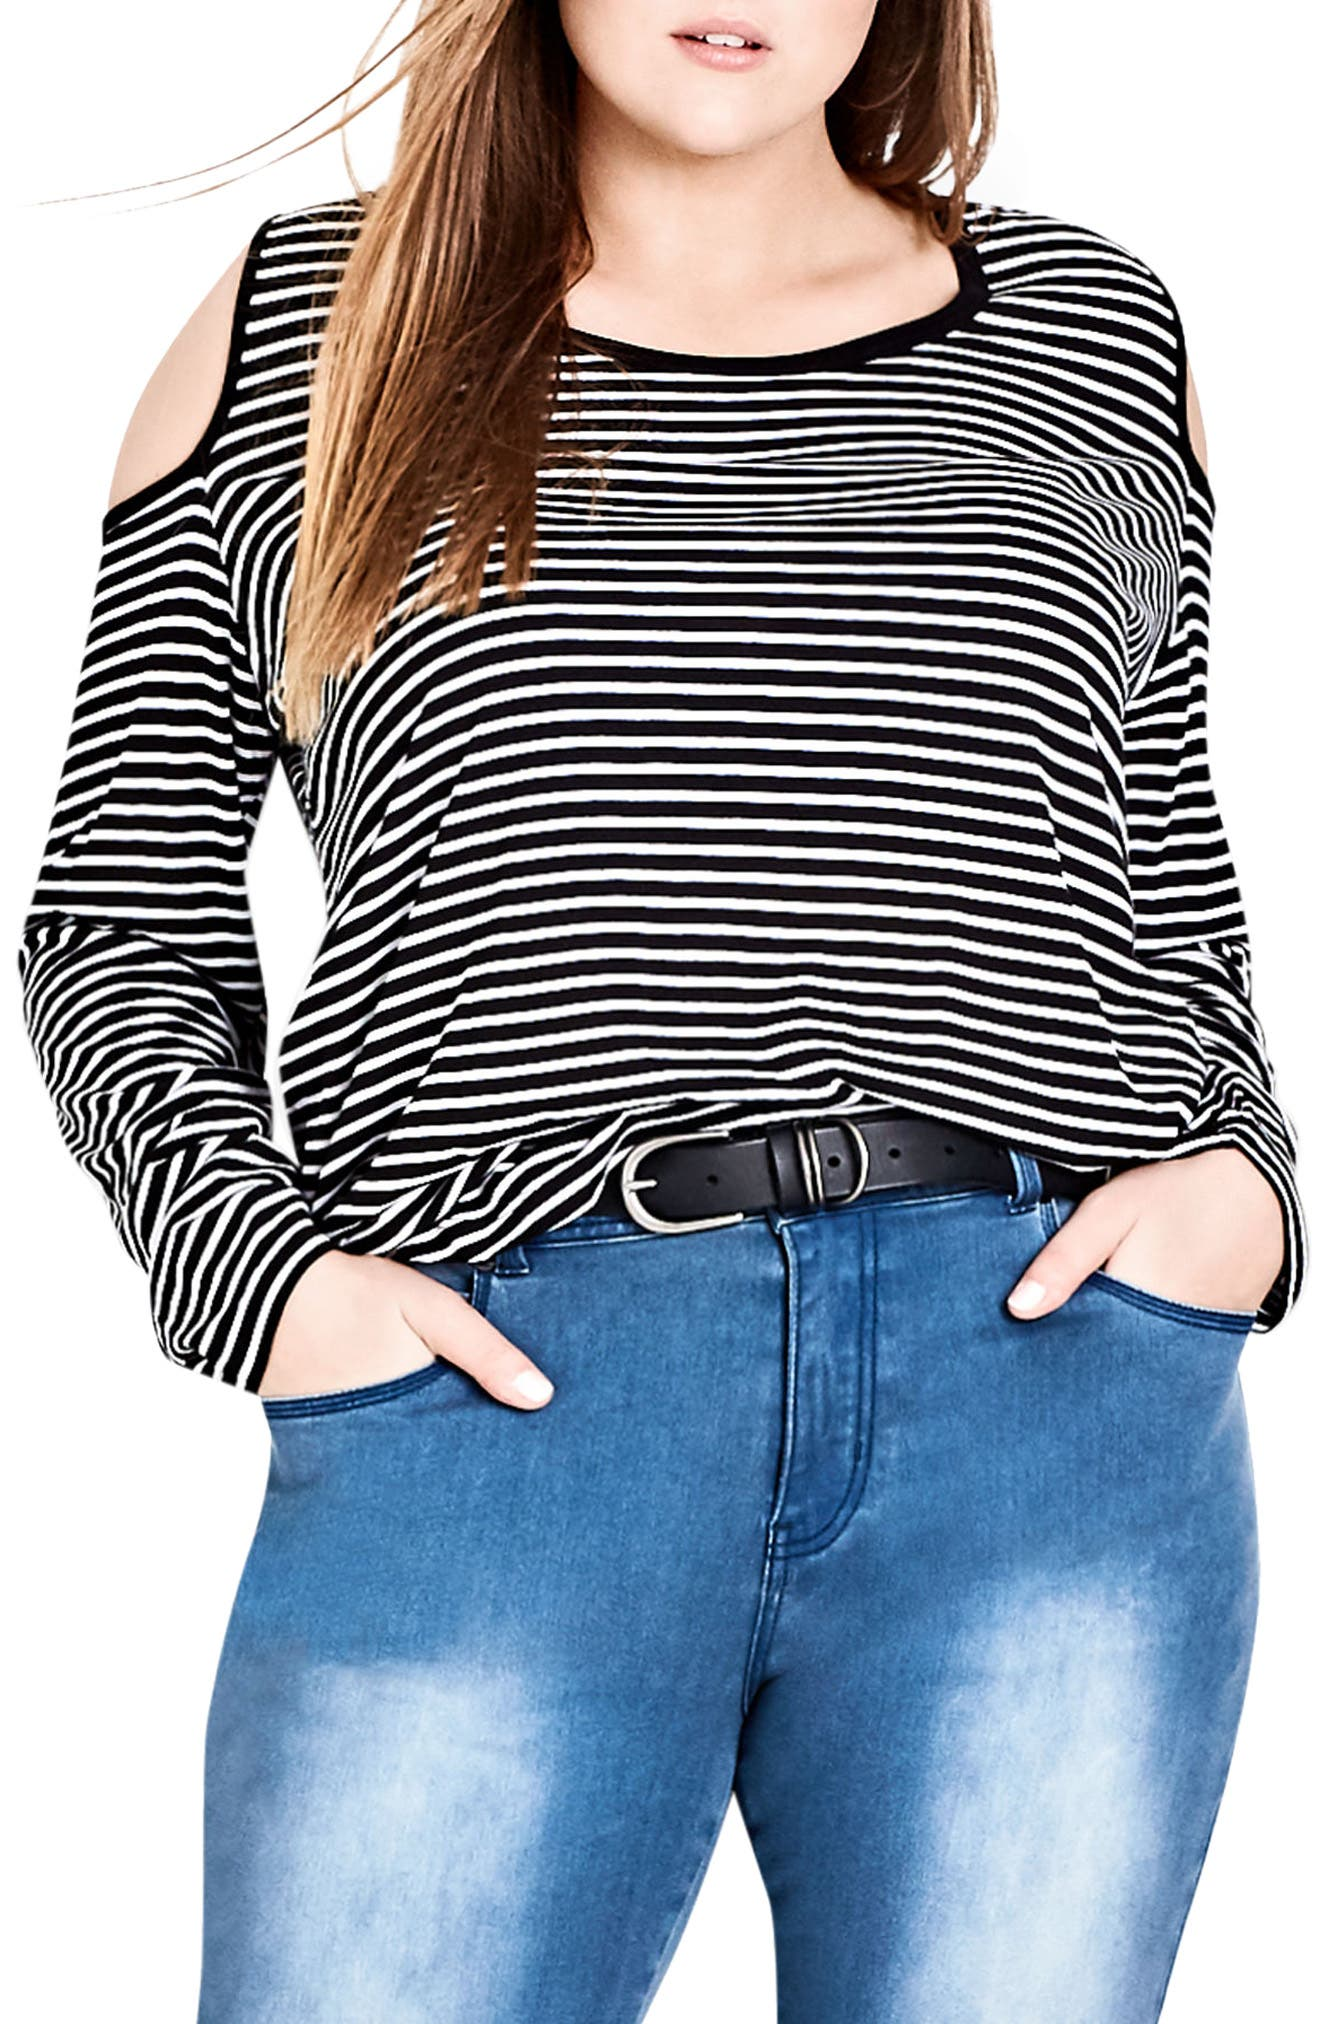 Main Image - City Chic Stripe Cold Shoulder Jersey Top (Plus Size)